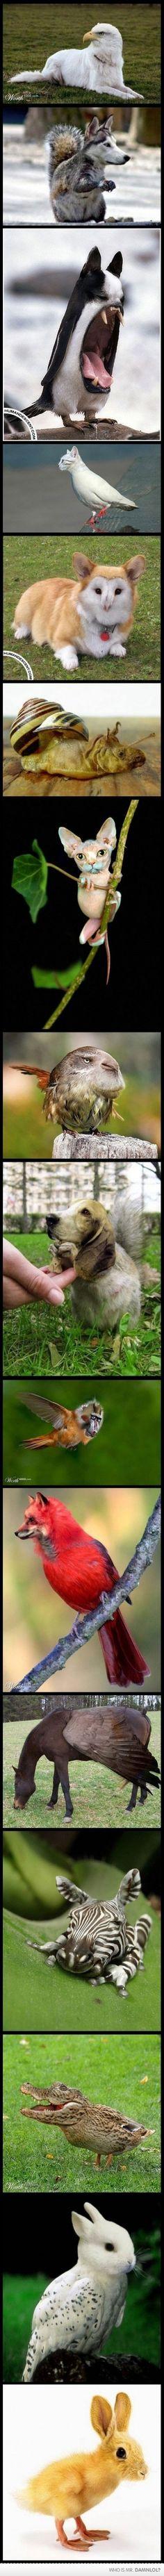 #mademyday #hahaha #animalbodieswithwronghead